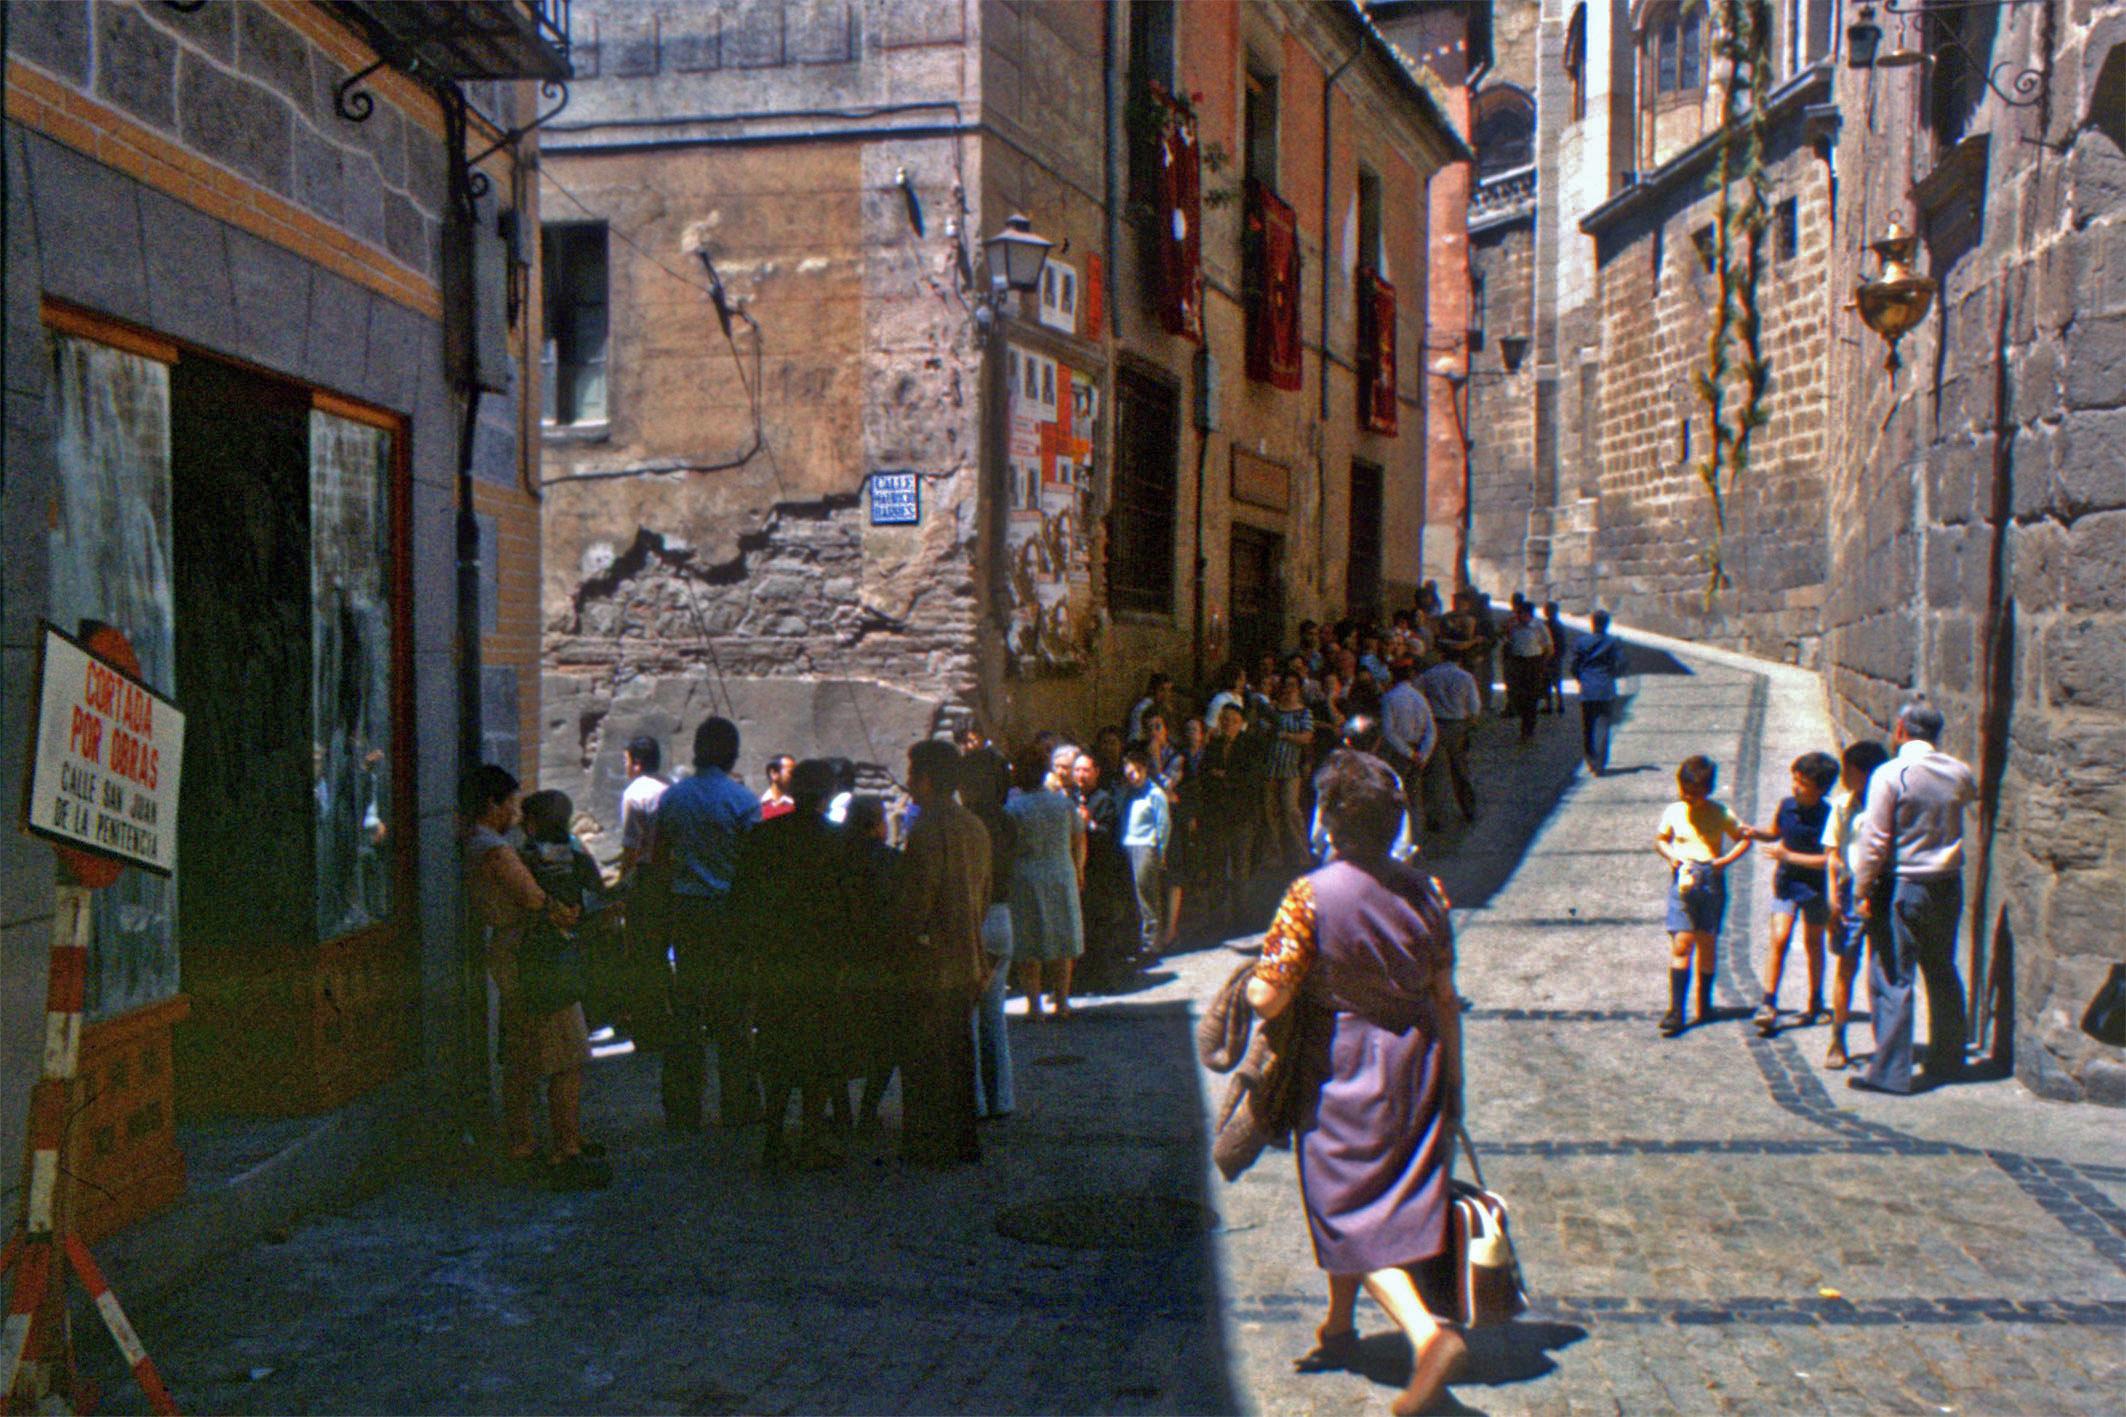 20th century in Spain (easy)